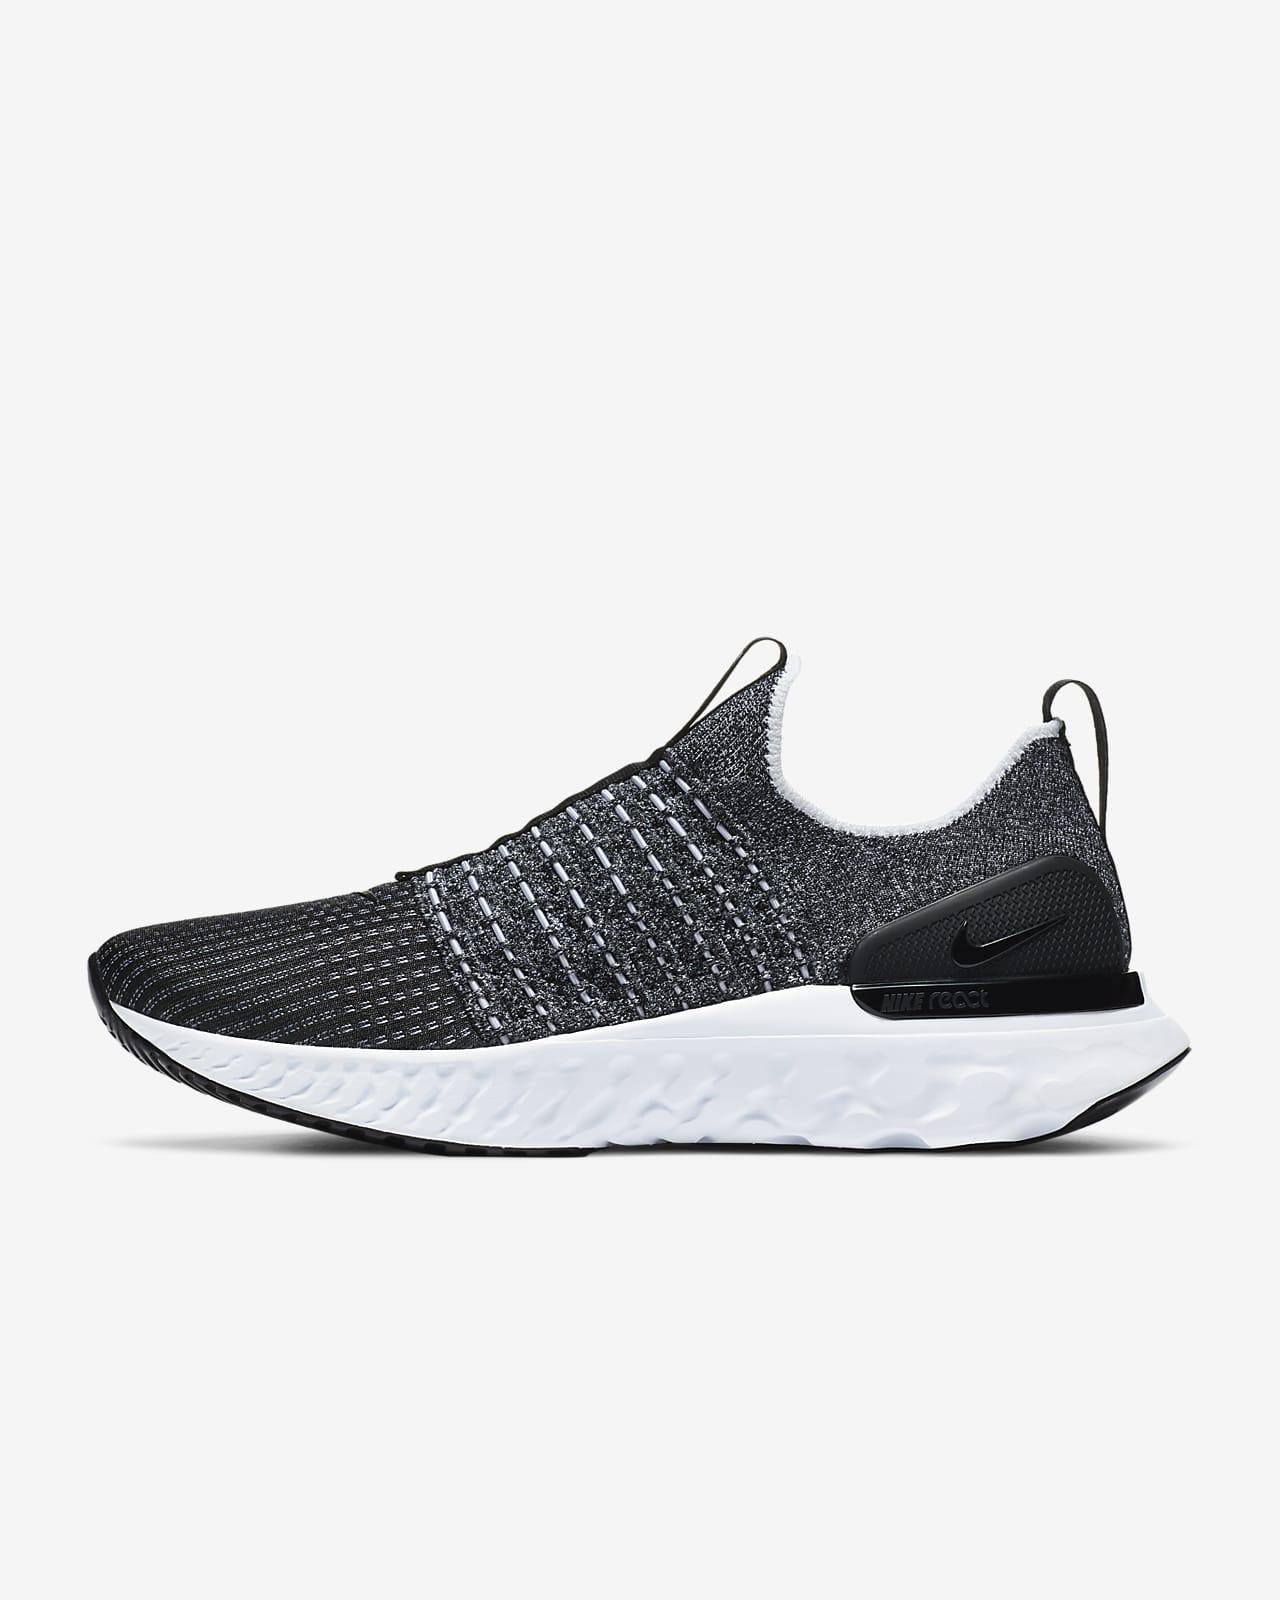 Nike React Phantom Run Flyknit 2 Men's Road Running Shoes